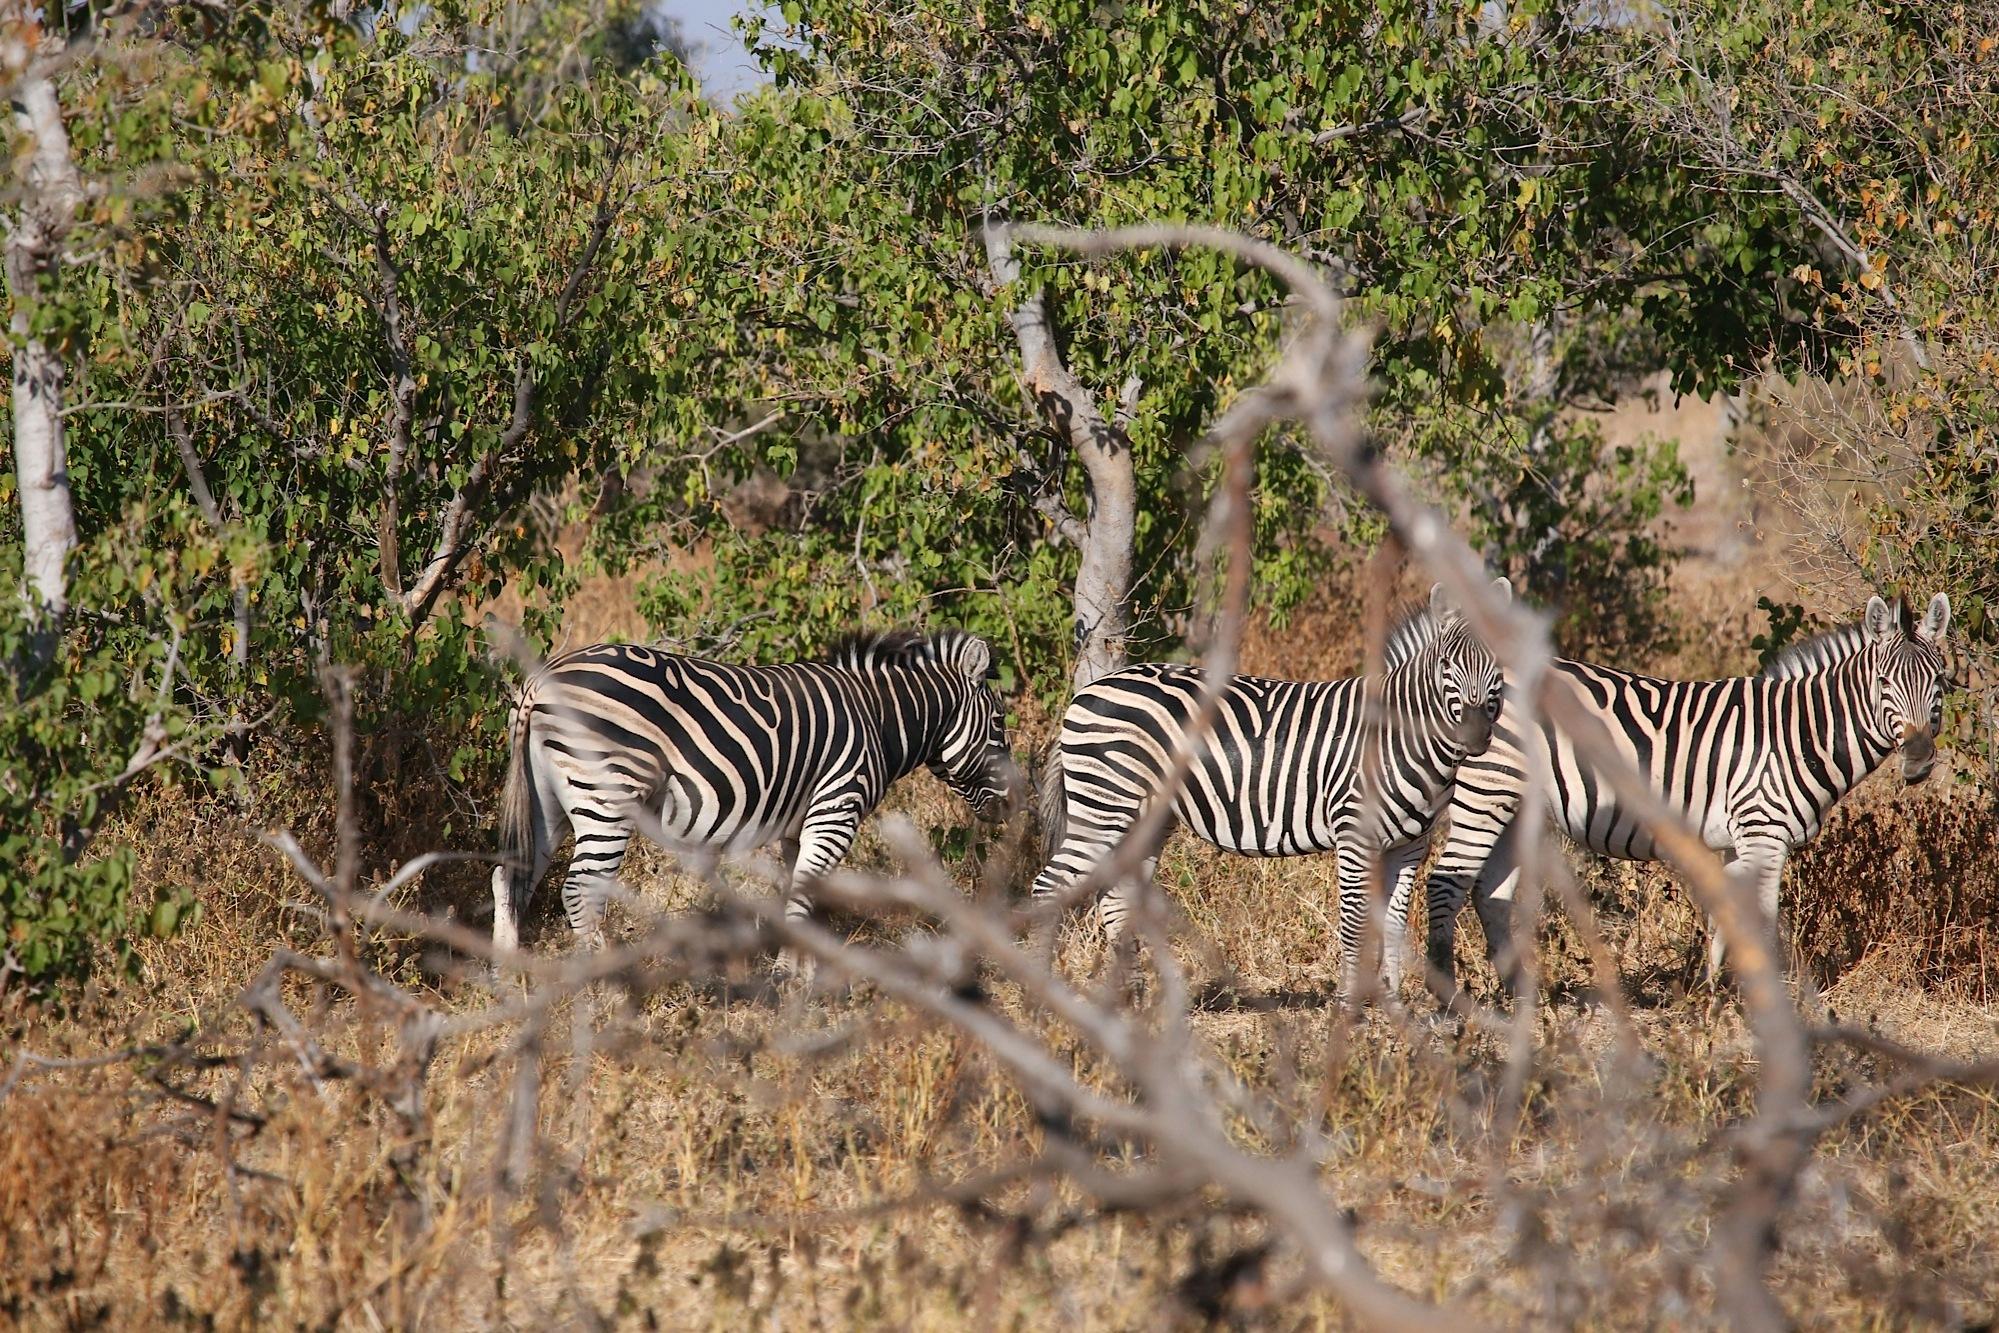 Grevy's zebra (Equus grevyi) by Laurie Puglia